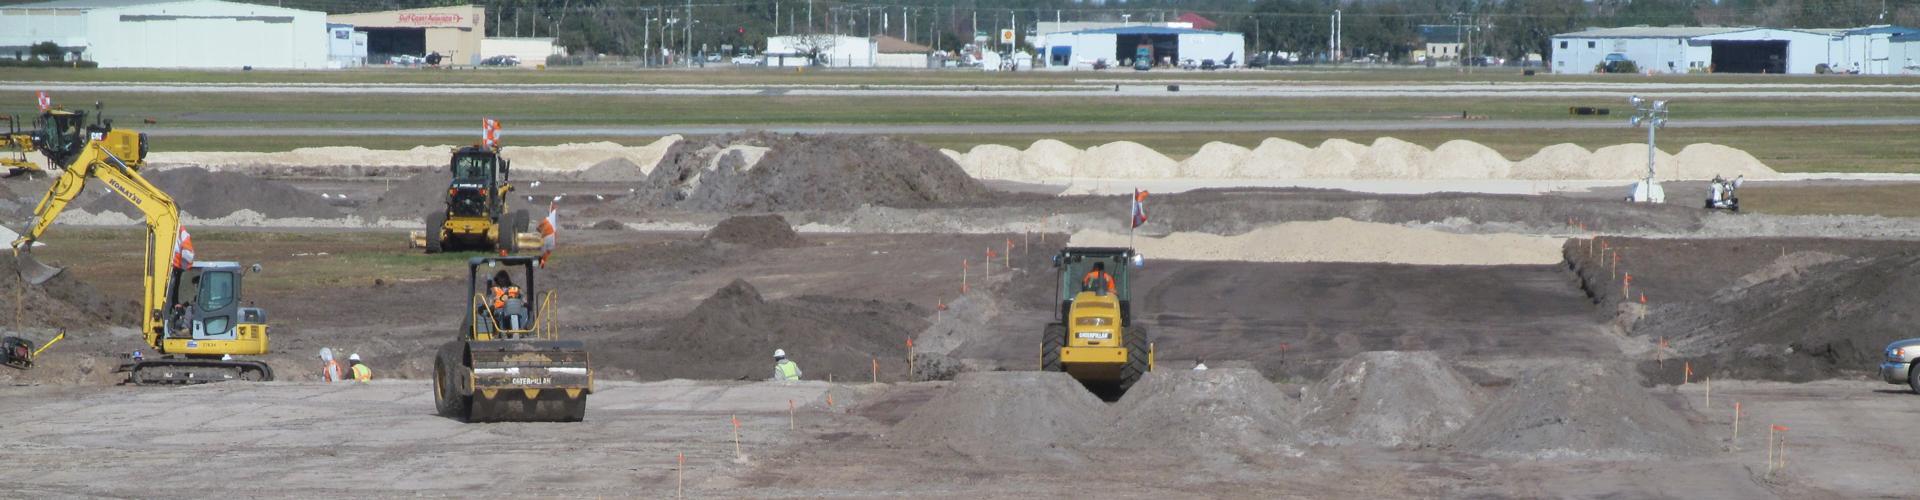 Construction work at Lakeland Airport